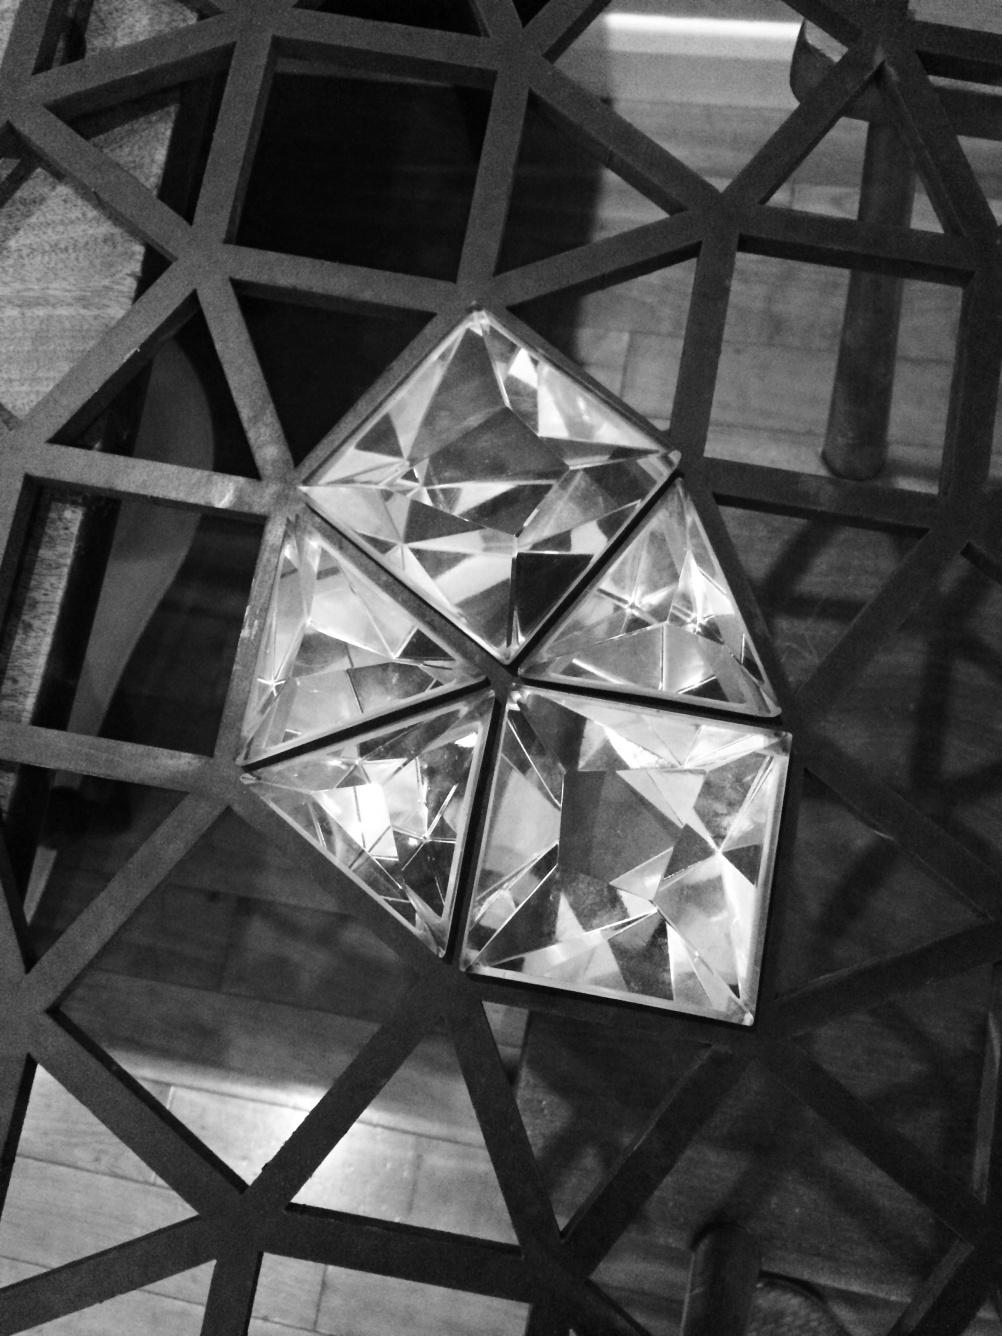 ZETTELER_Ommatidium_Images_14